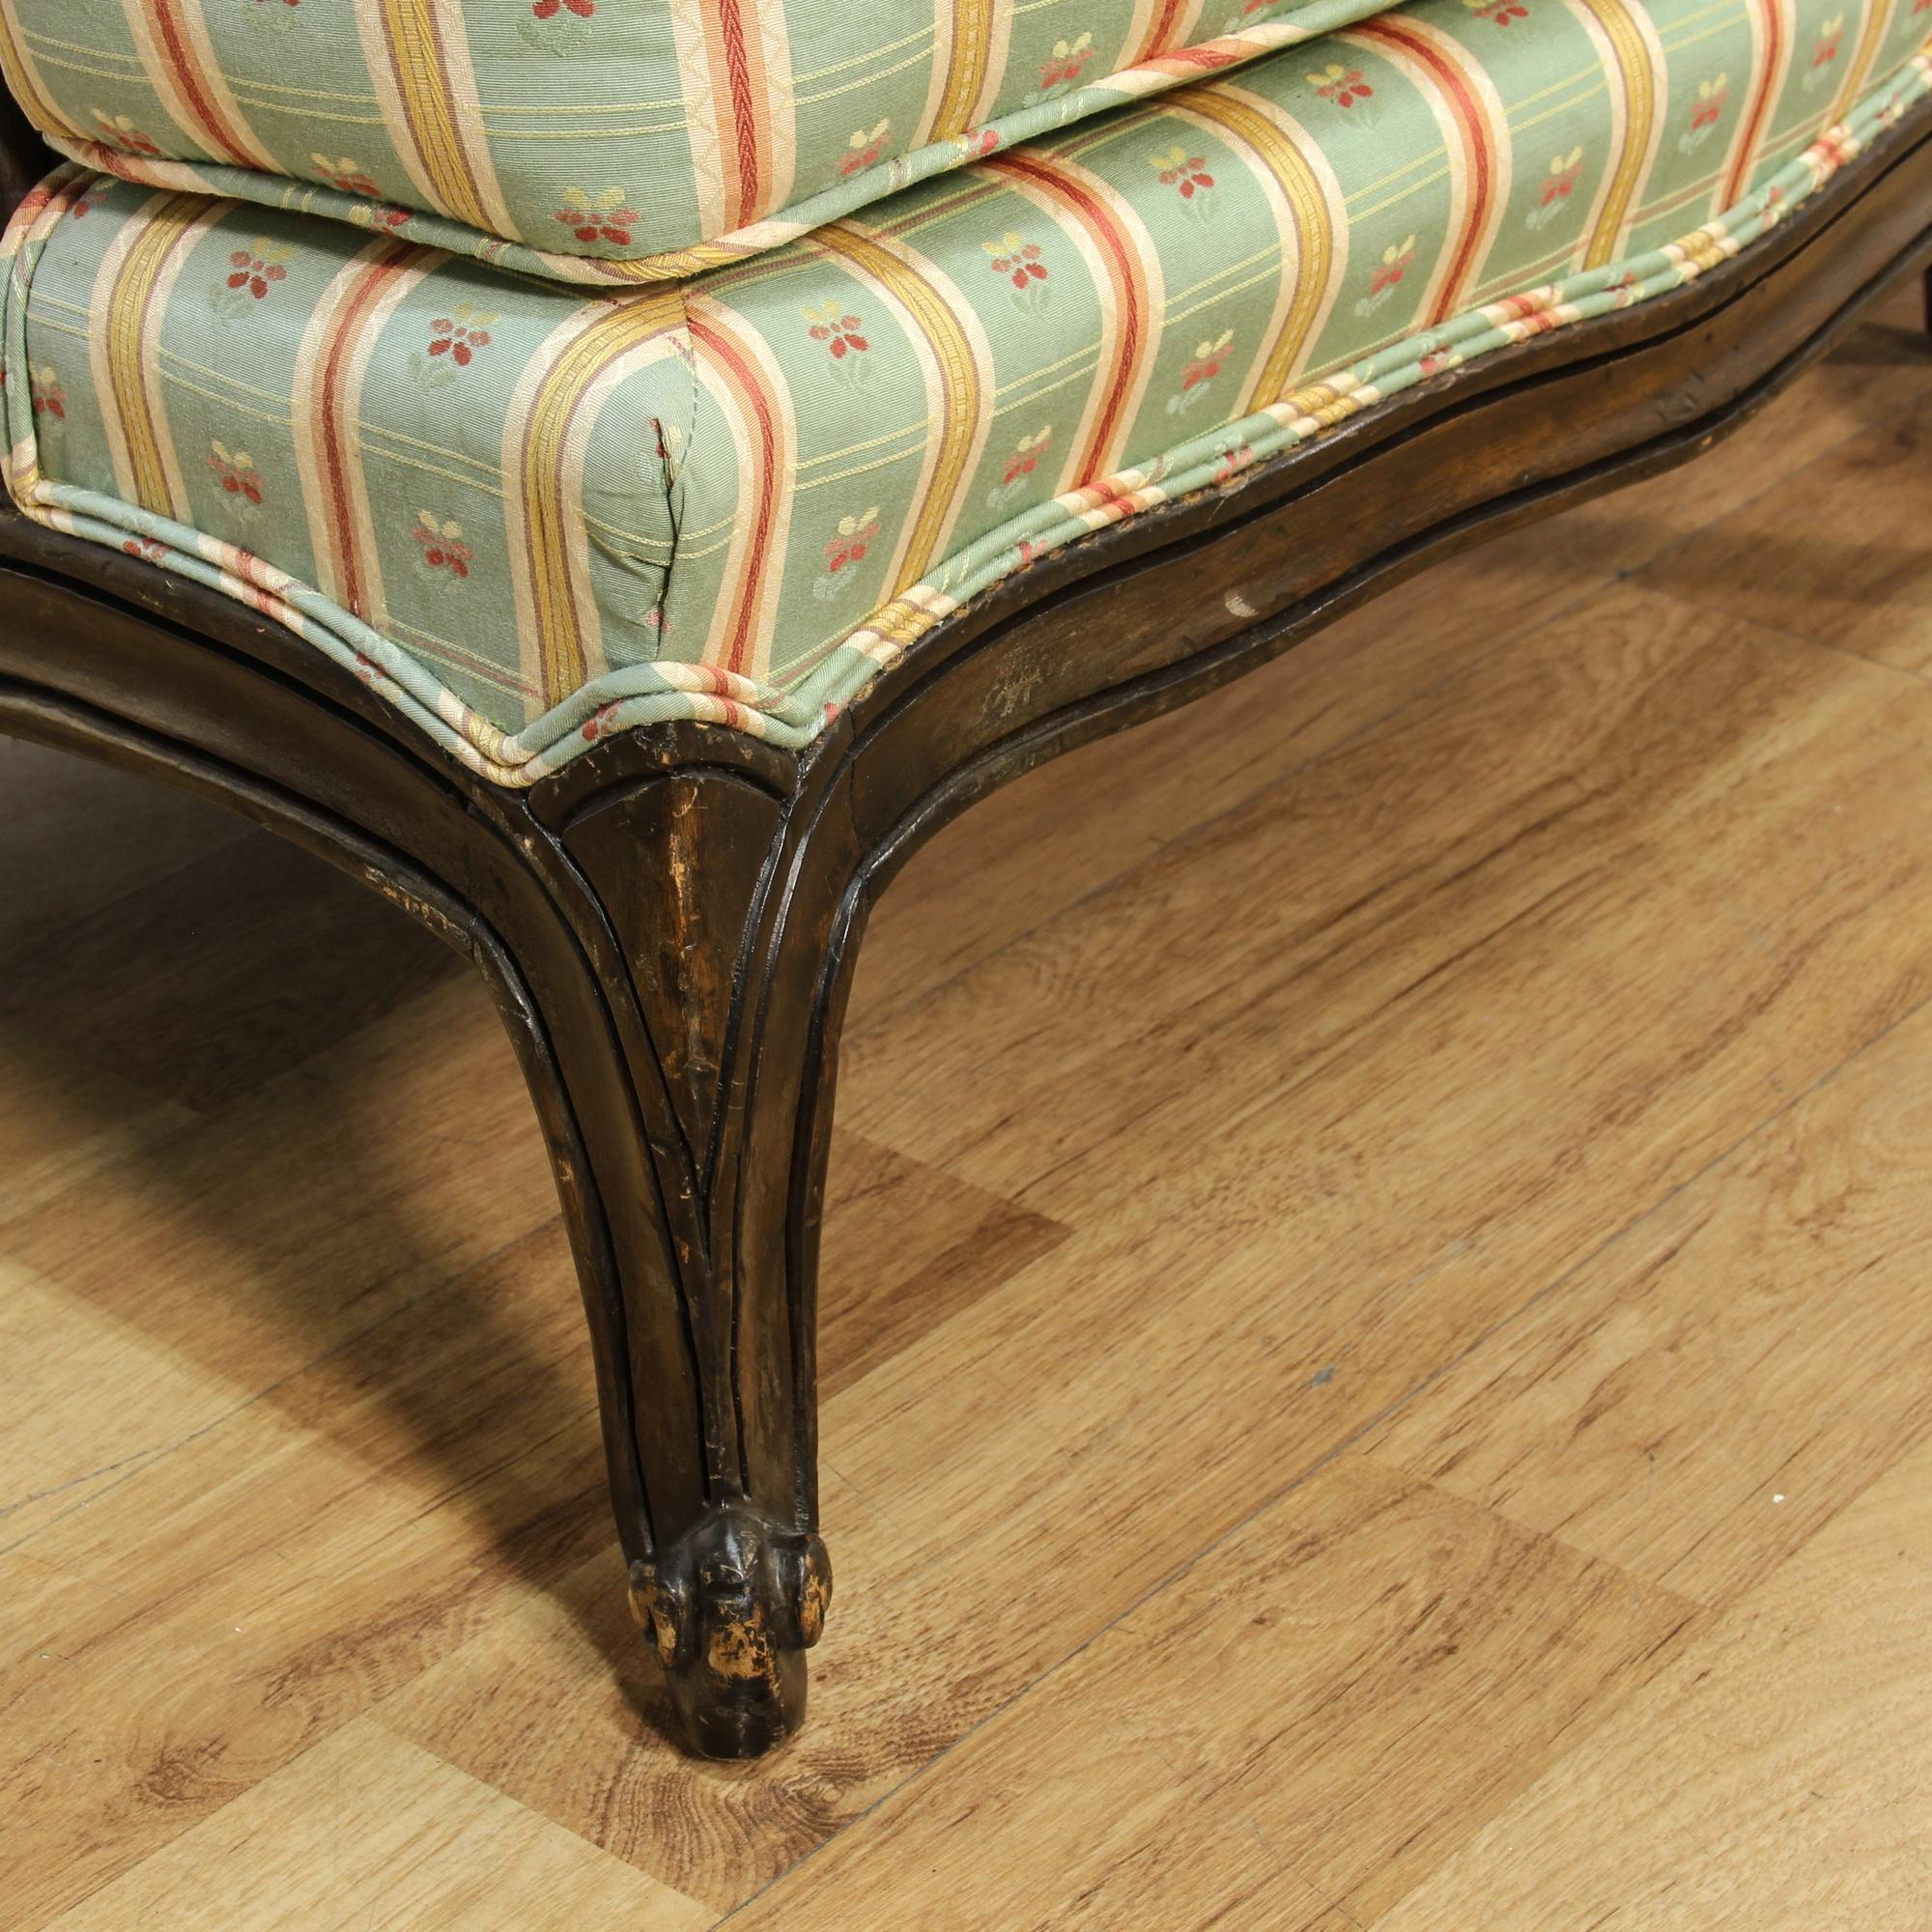 American Furniture Warehouse Desks ... & Ottoman | Loveseat Vintage Furniture San Diego & Los Angeles